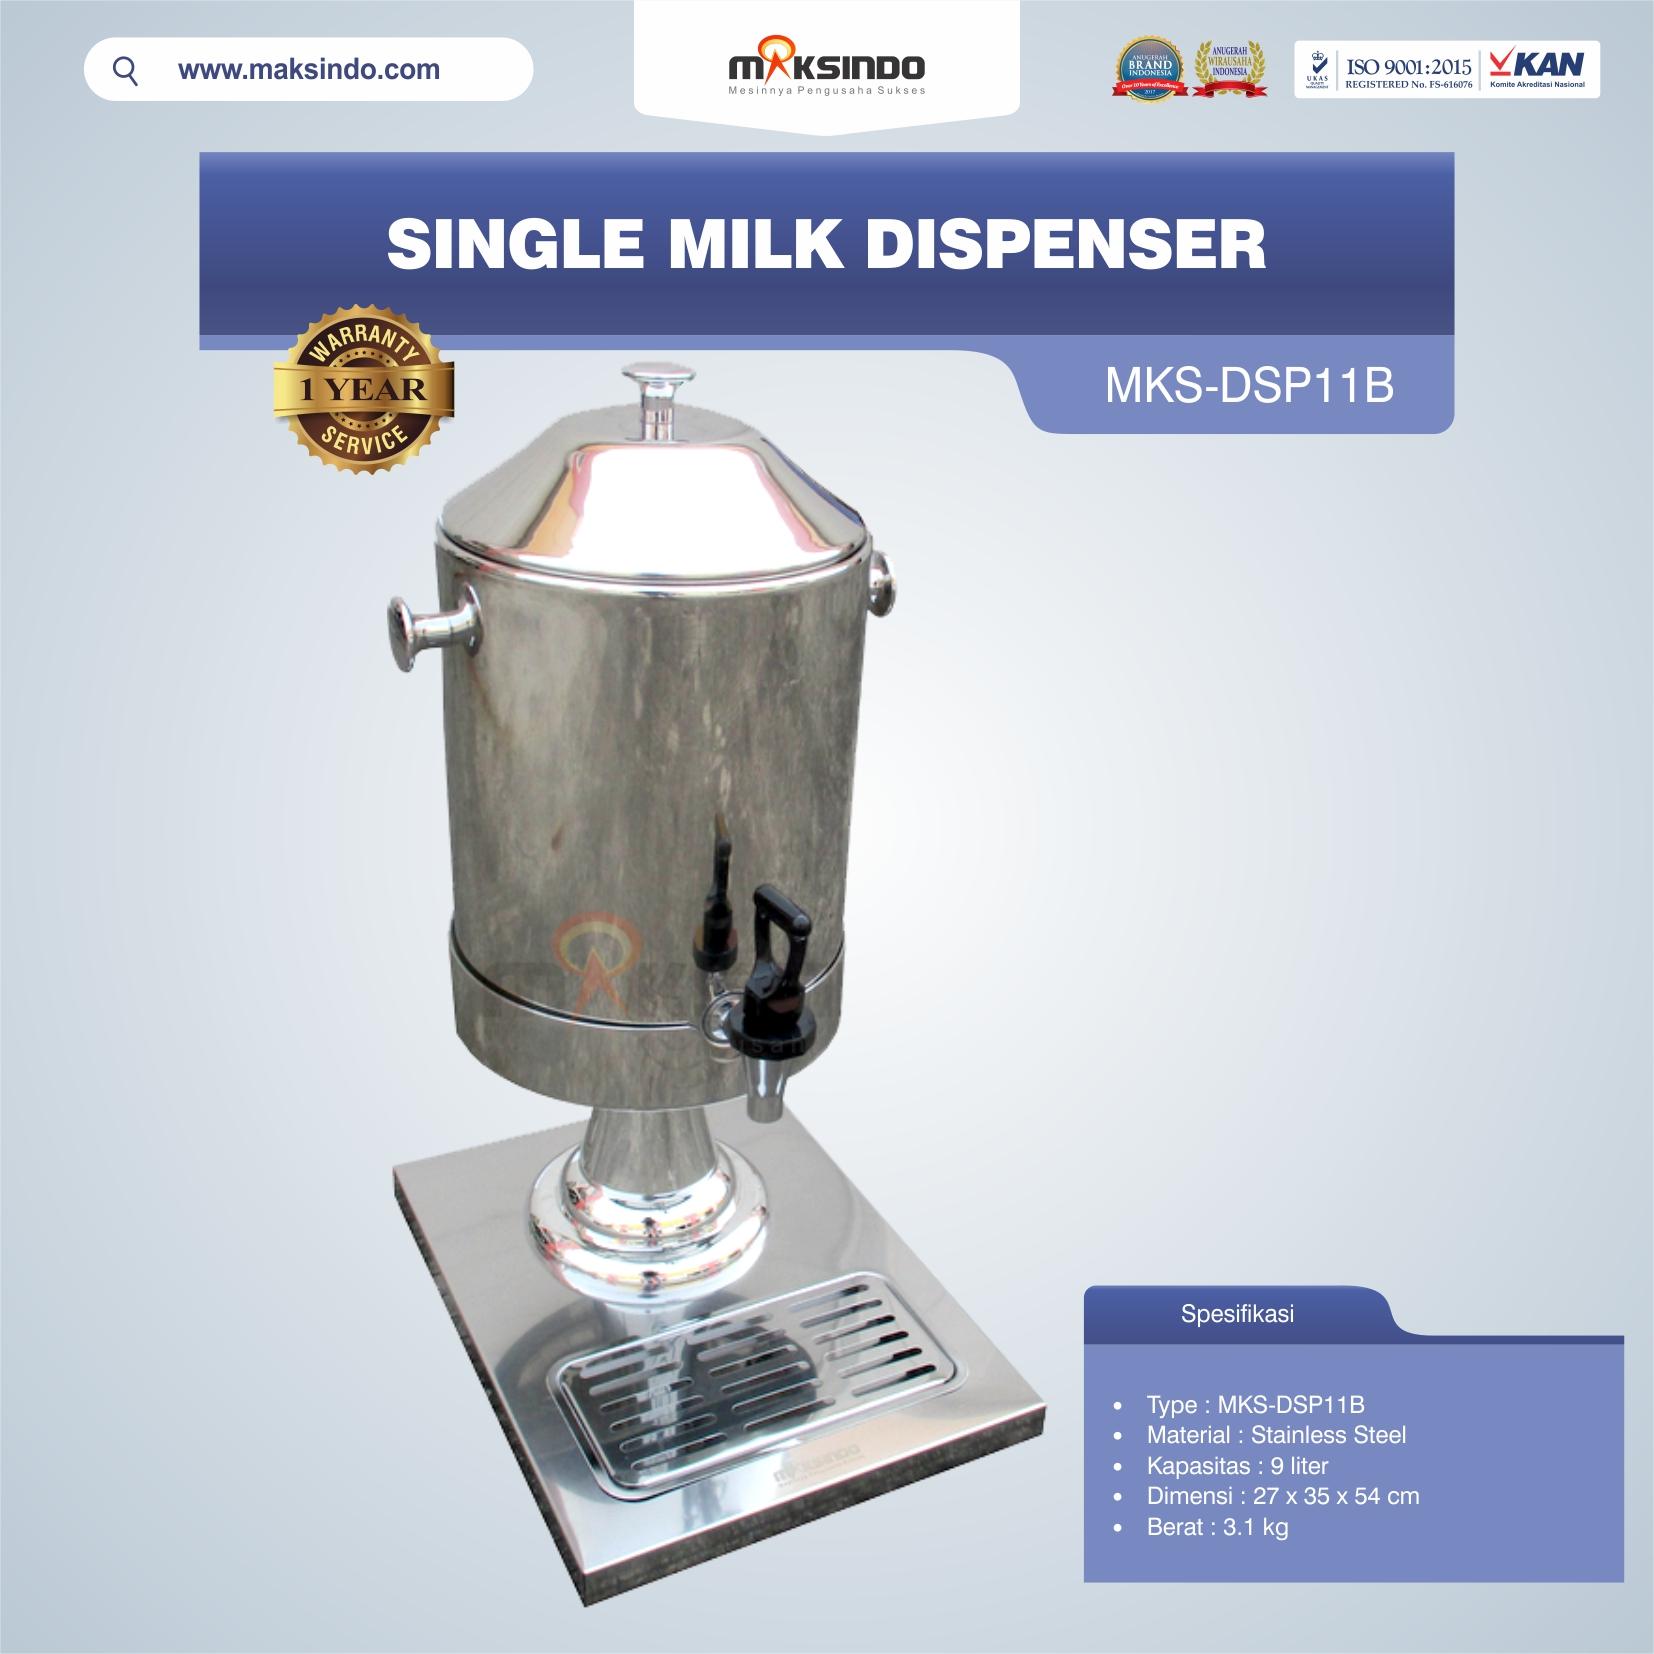 Single Milk Dispenser MKS-DSP11B